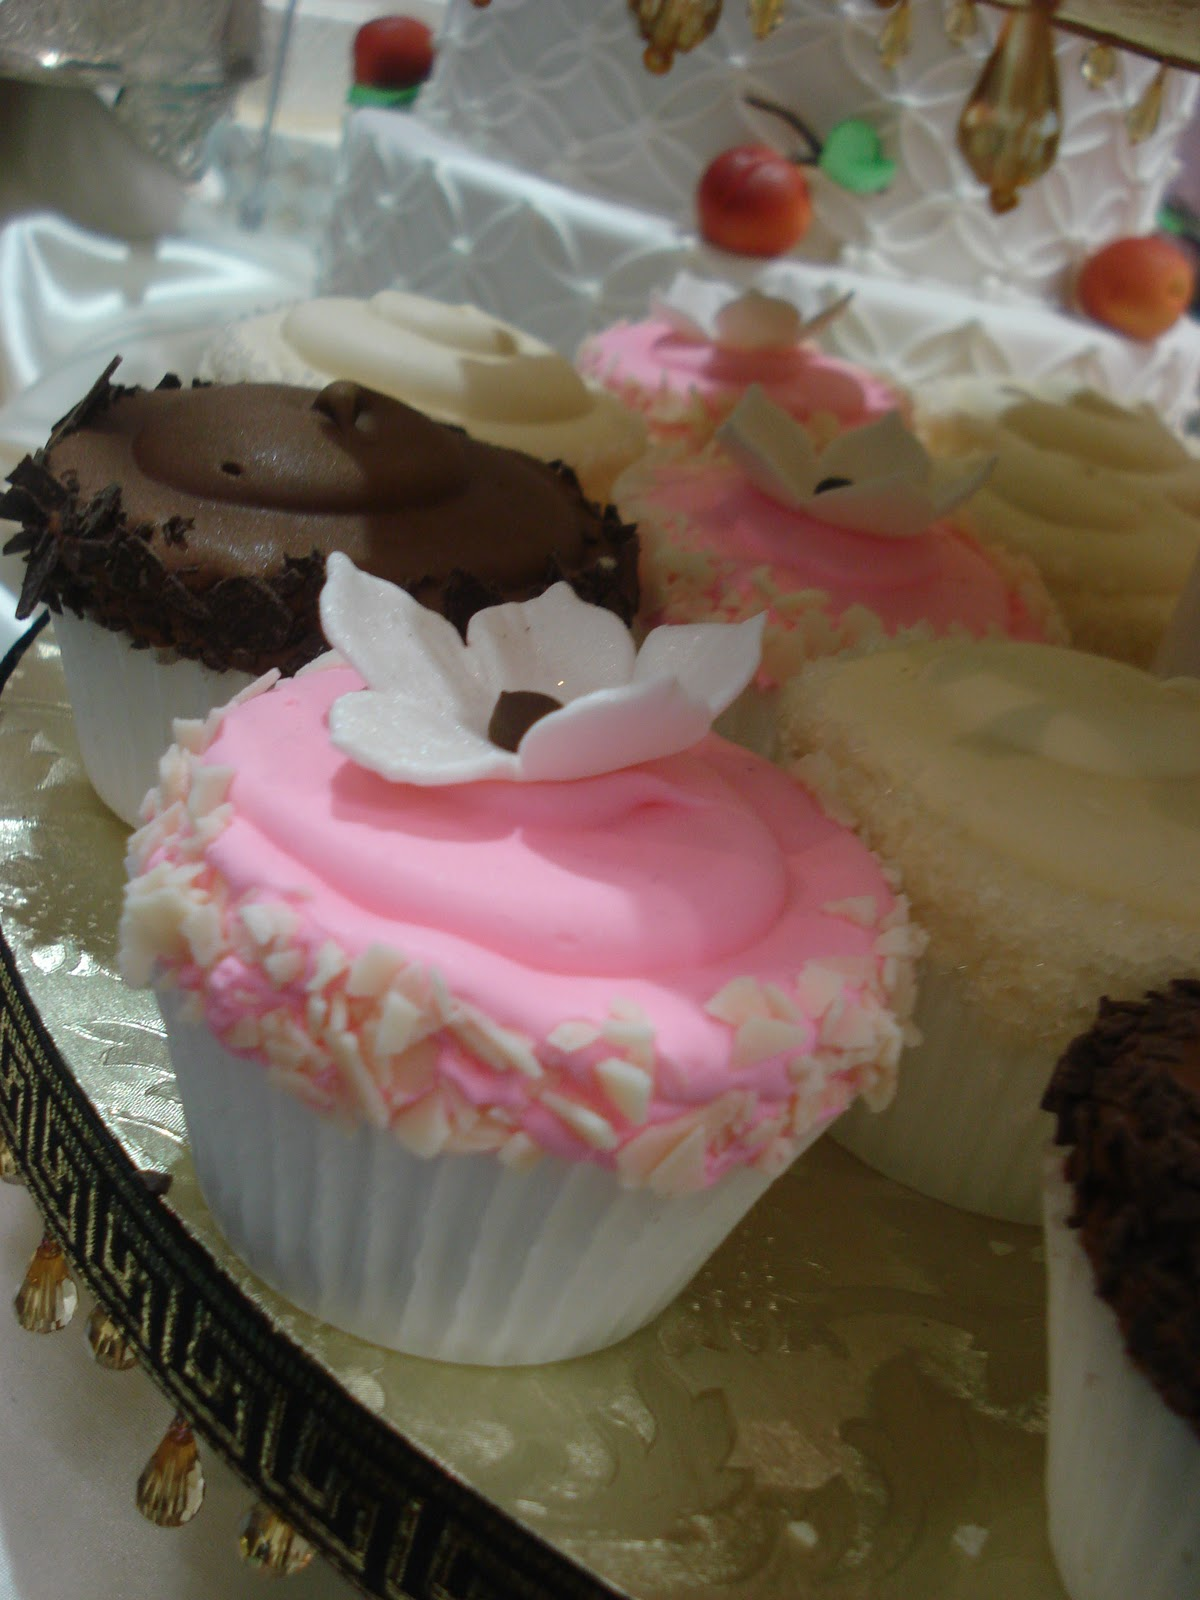 http://2.bp.blogspot.com/_aXR8Bxp5OrI/TSk94rfAbWI/AAAAAAAAAEs/_P2IuzfKJys/s1600/pink+cupcake.jpg